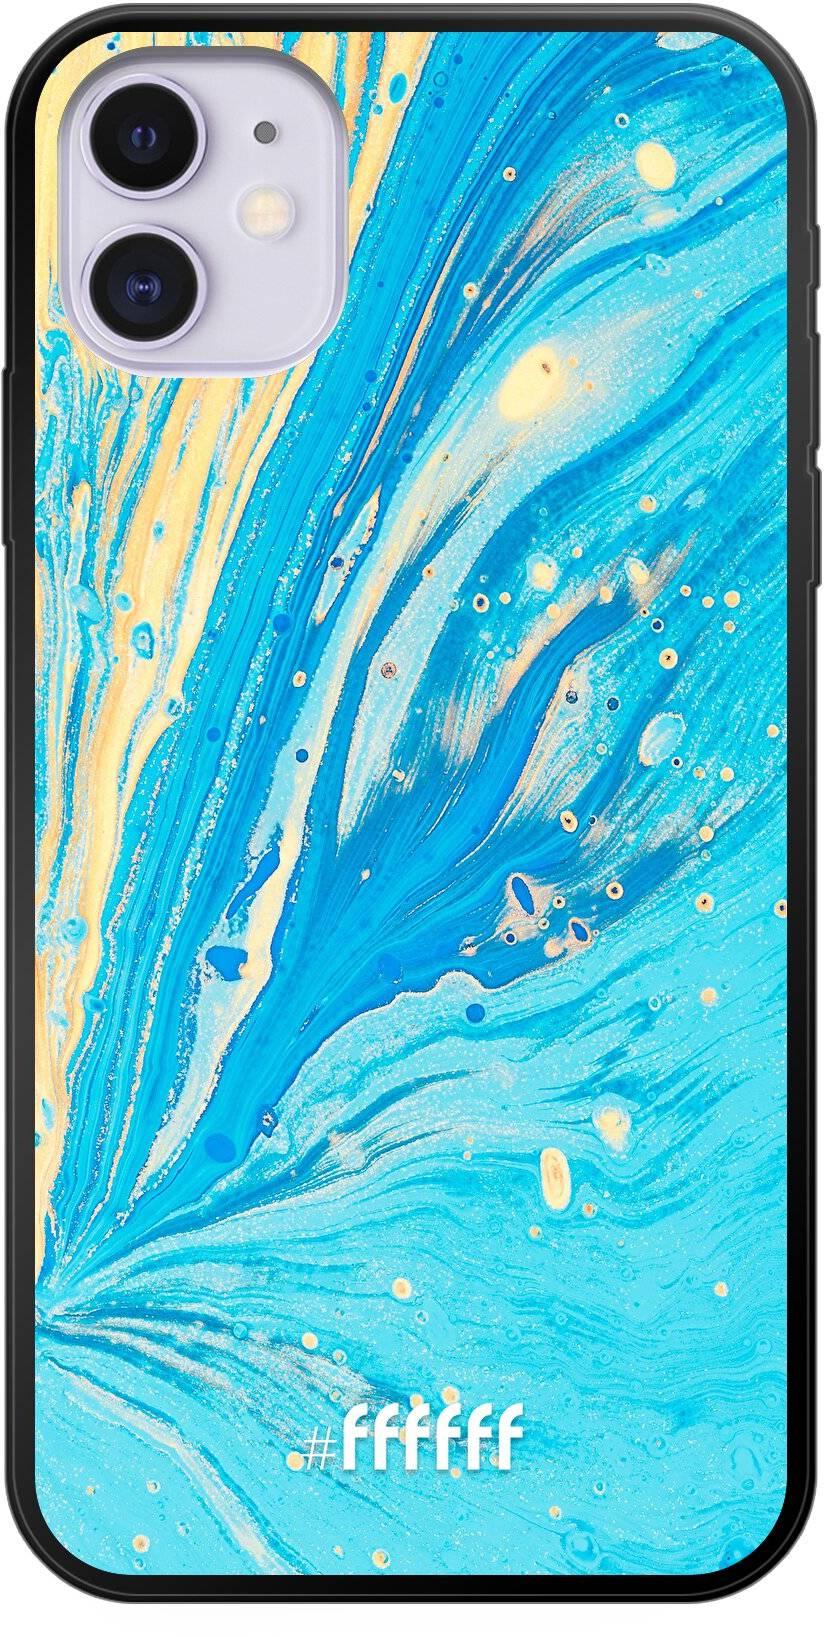 Endless Azure iPhone 11